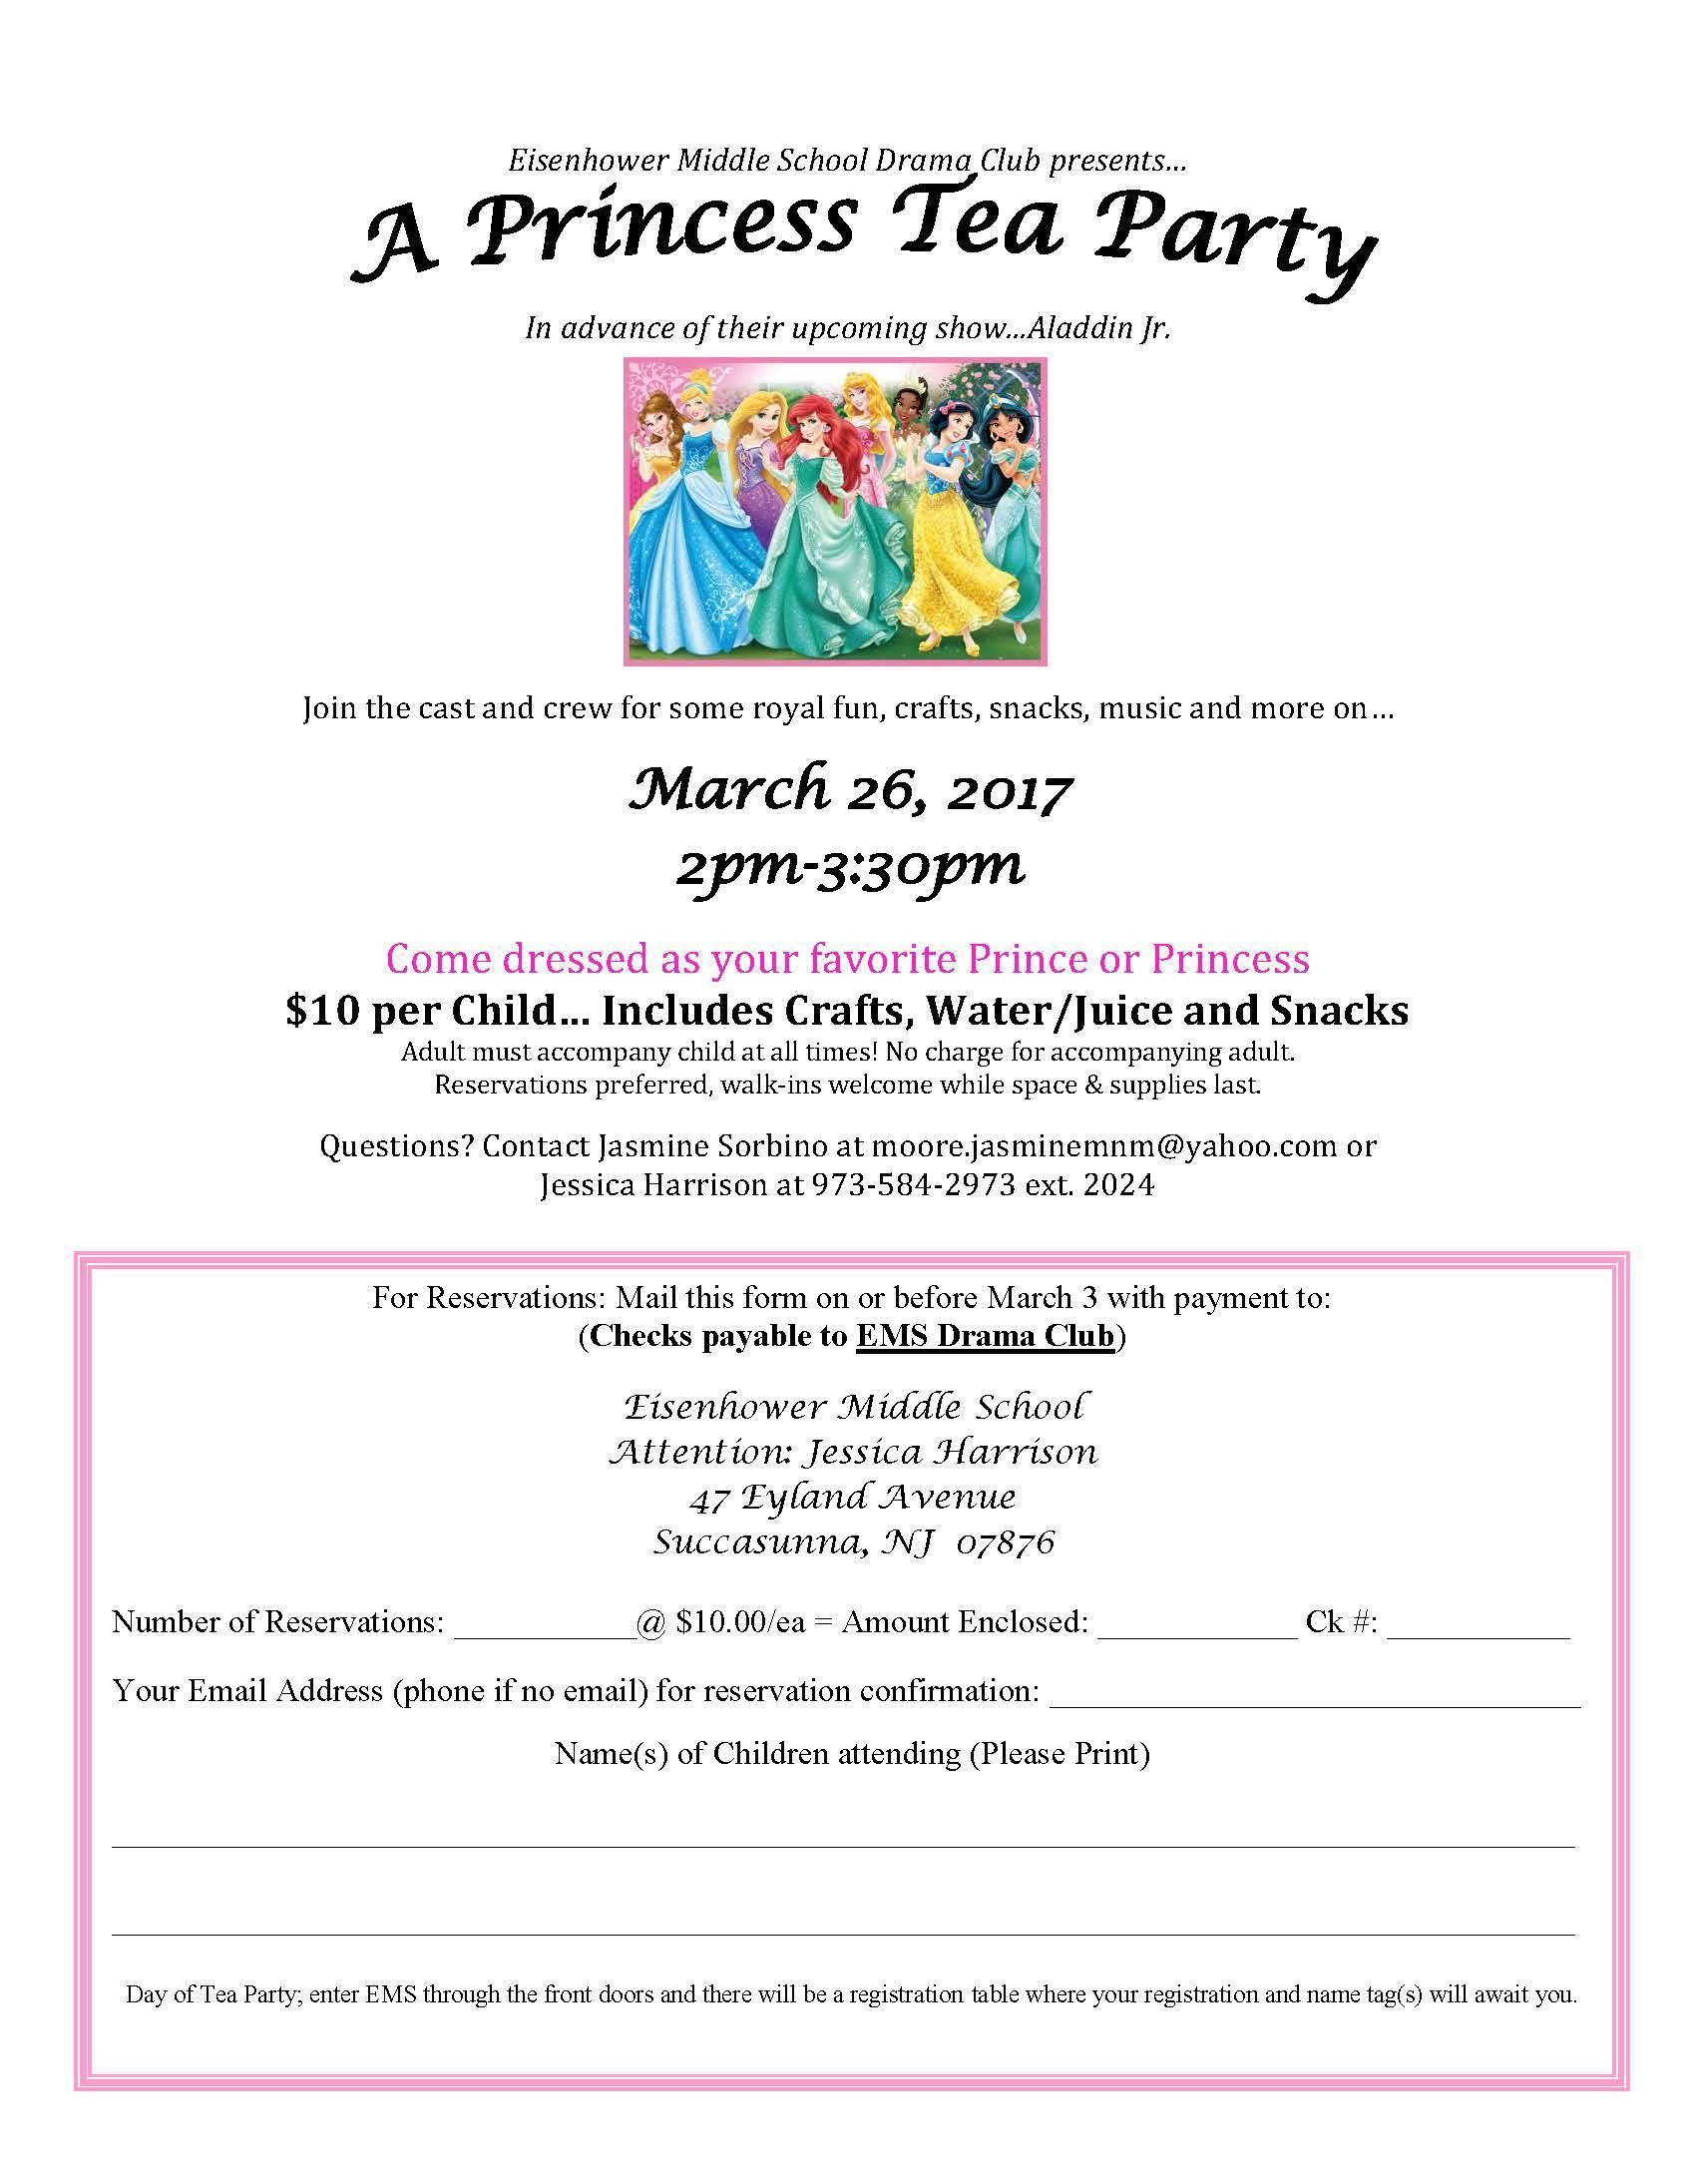 30aa955320565672e277_EMS_Princess_Tea_Party_Registration_Form_2017.jpg